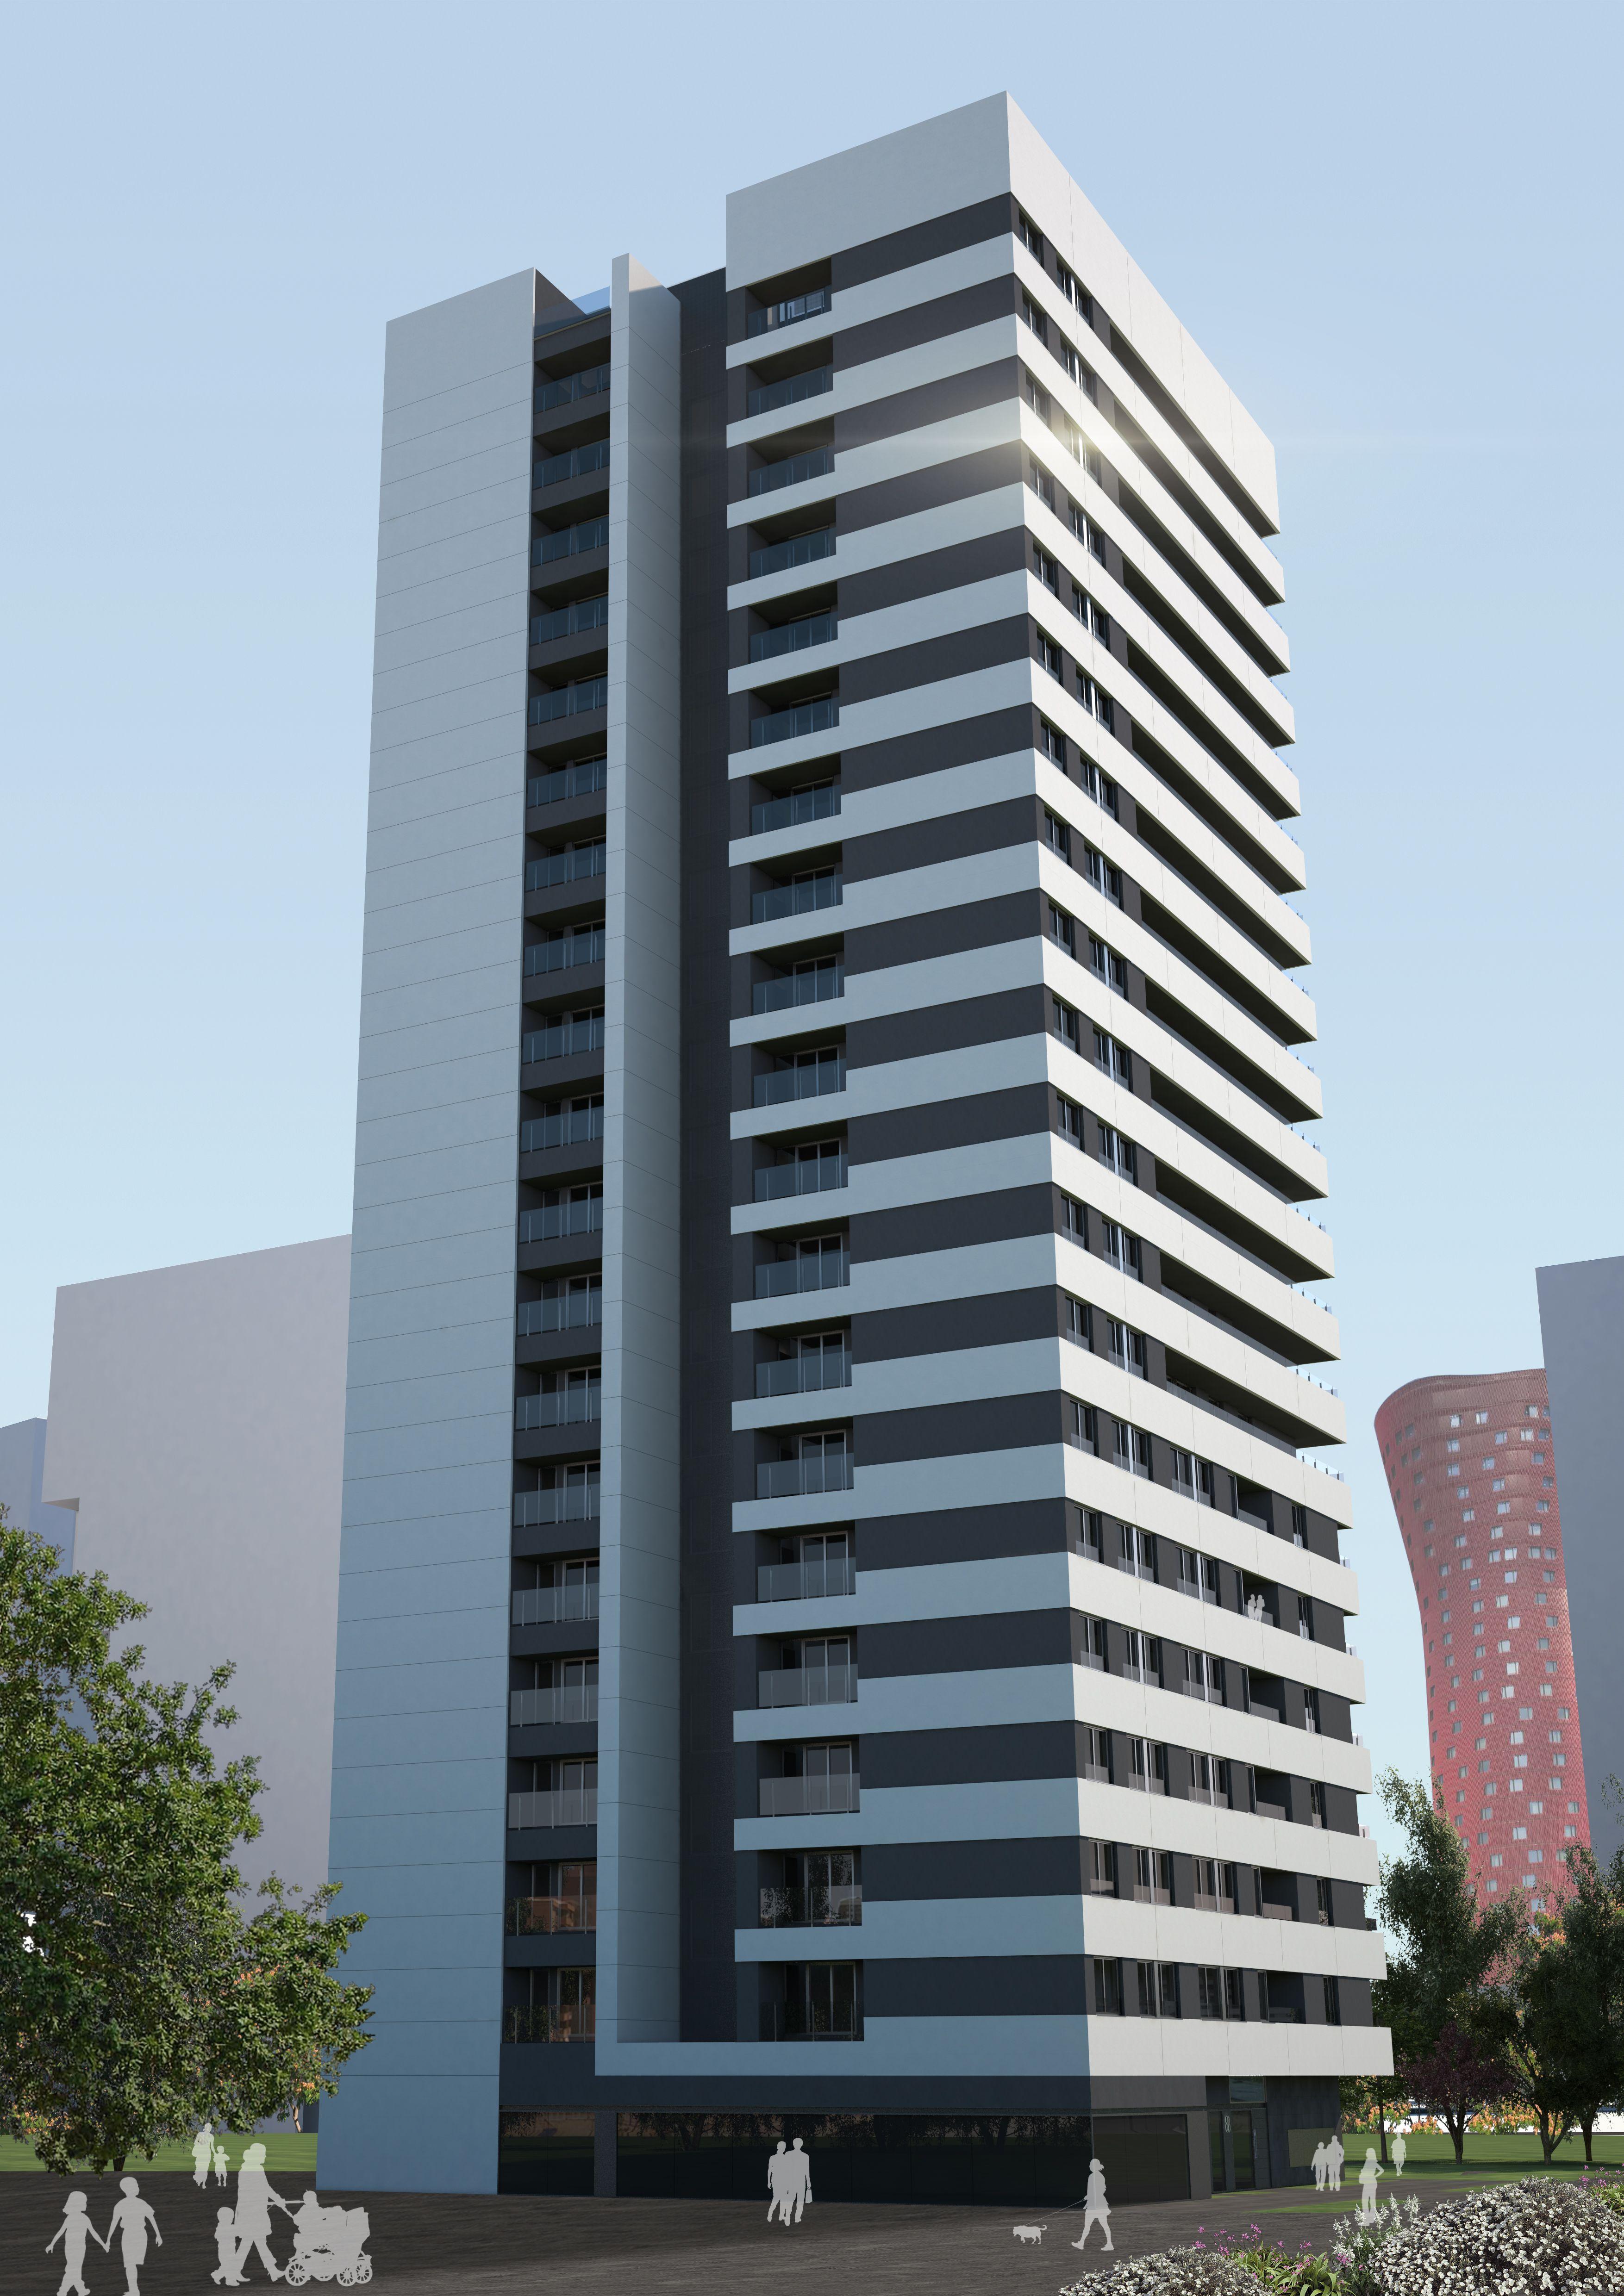 Edificoi de la promoci n de viviendas torre plaza europa for Gimnasio hospitalet